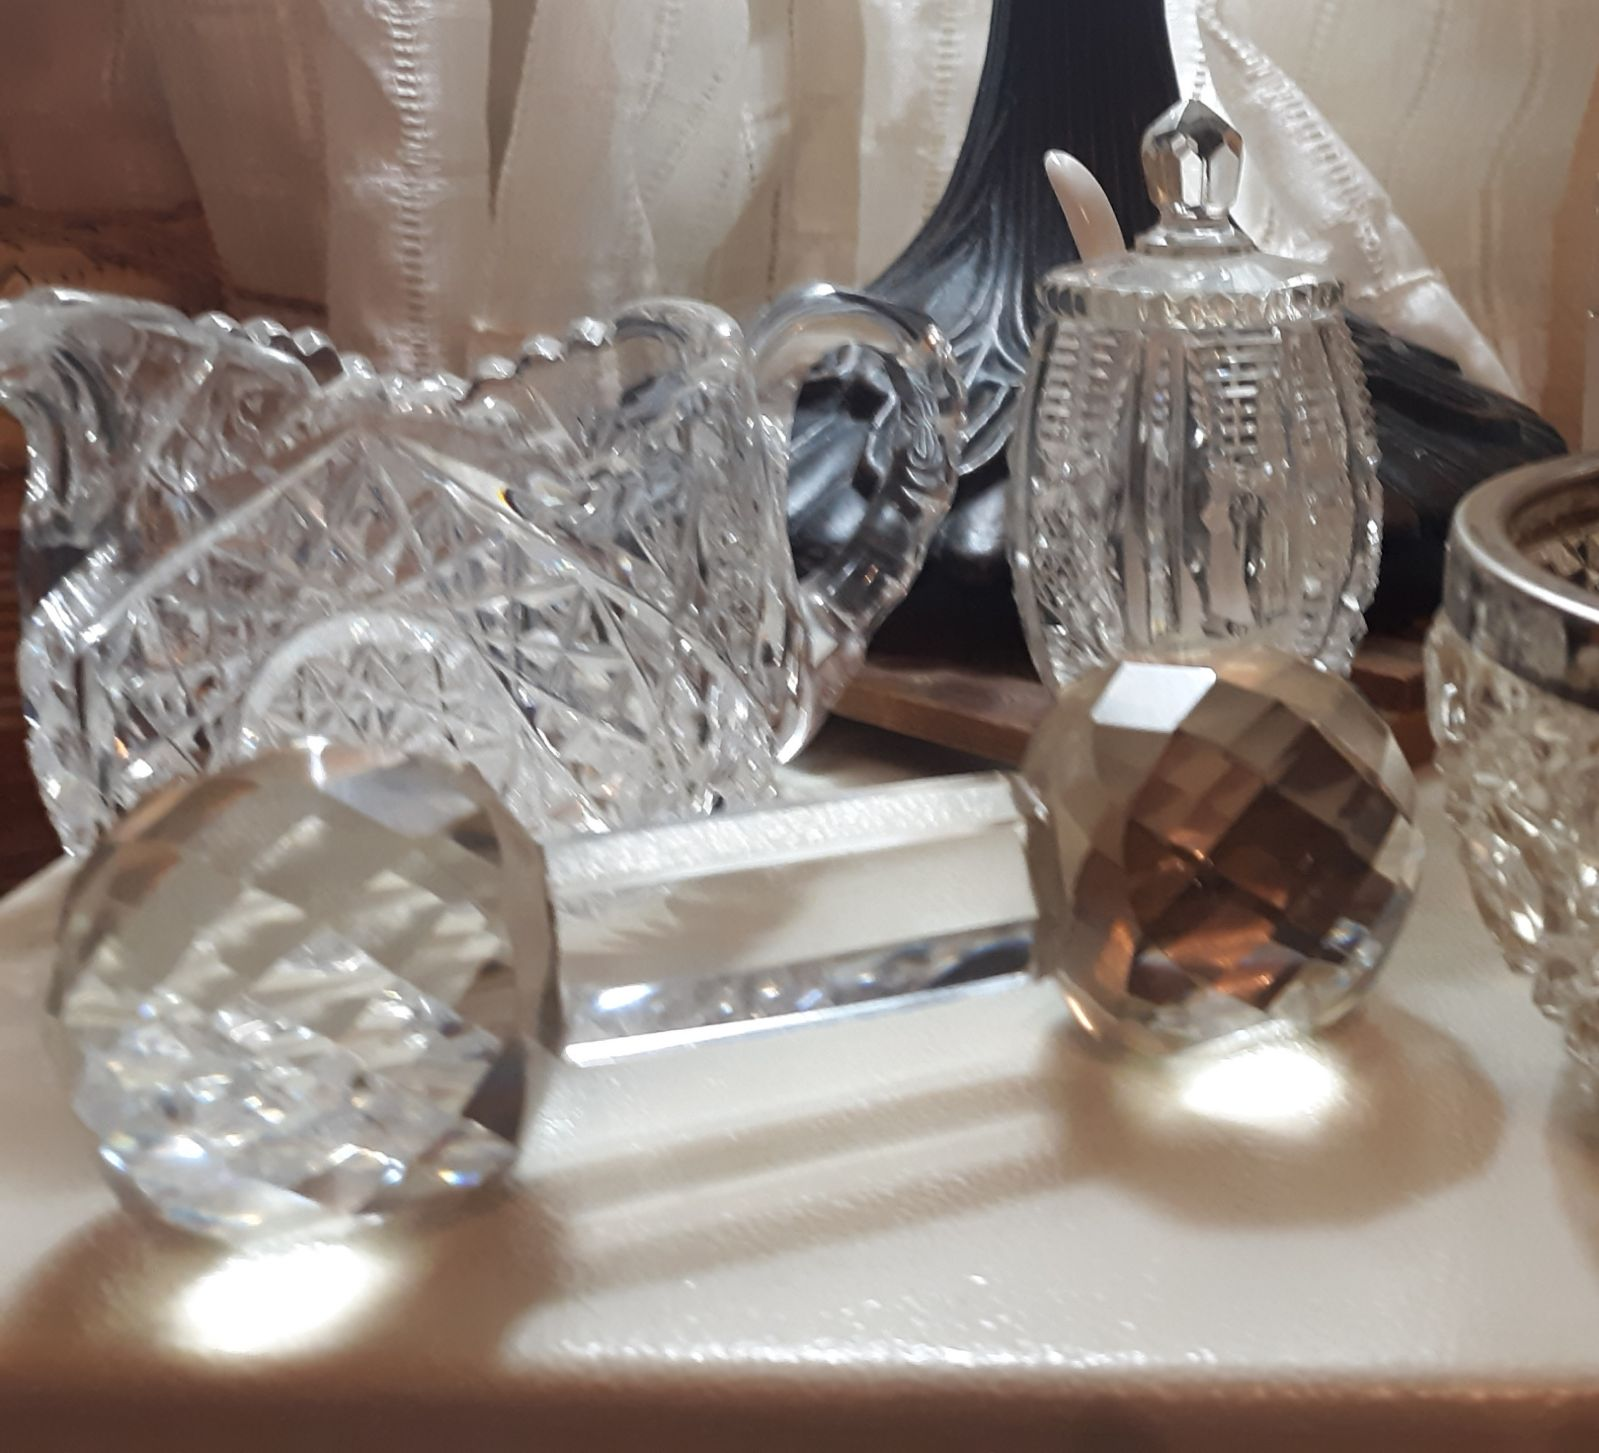 Lot of crystal stemware, tea service acc